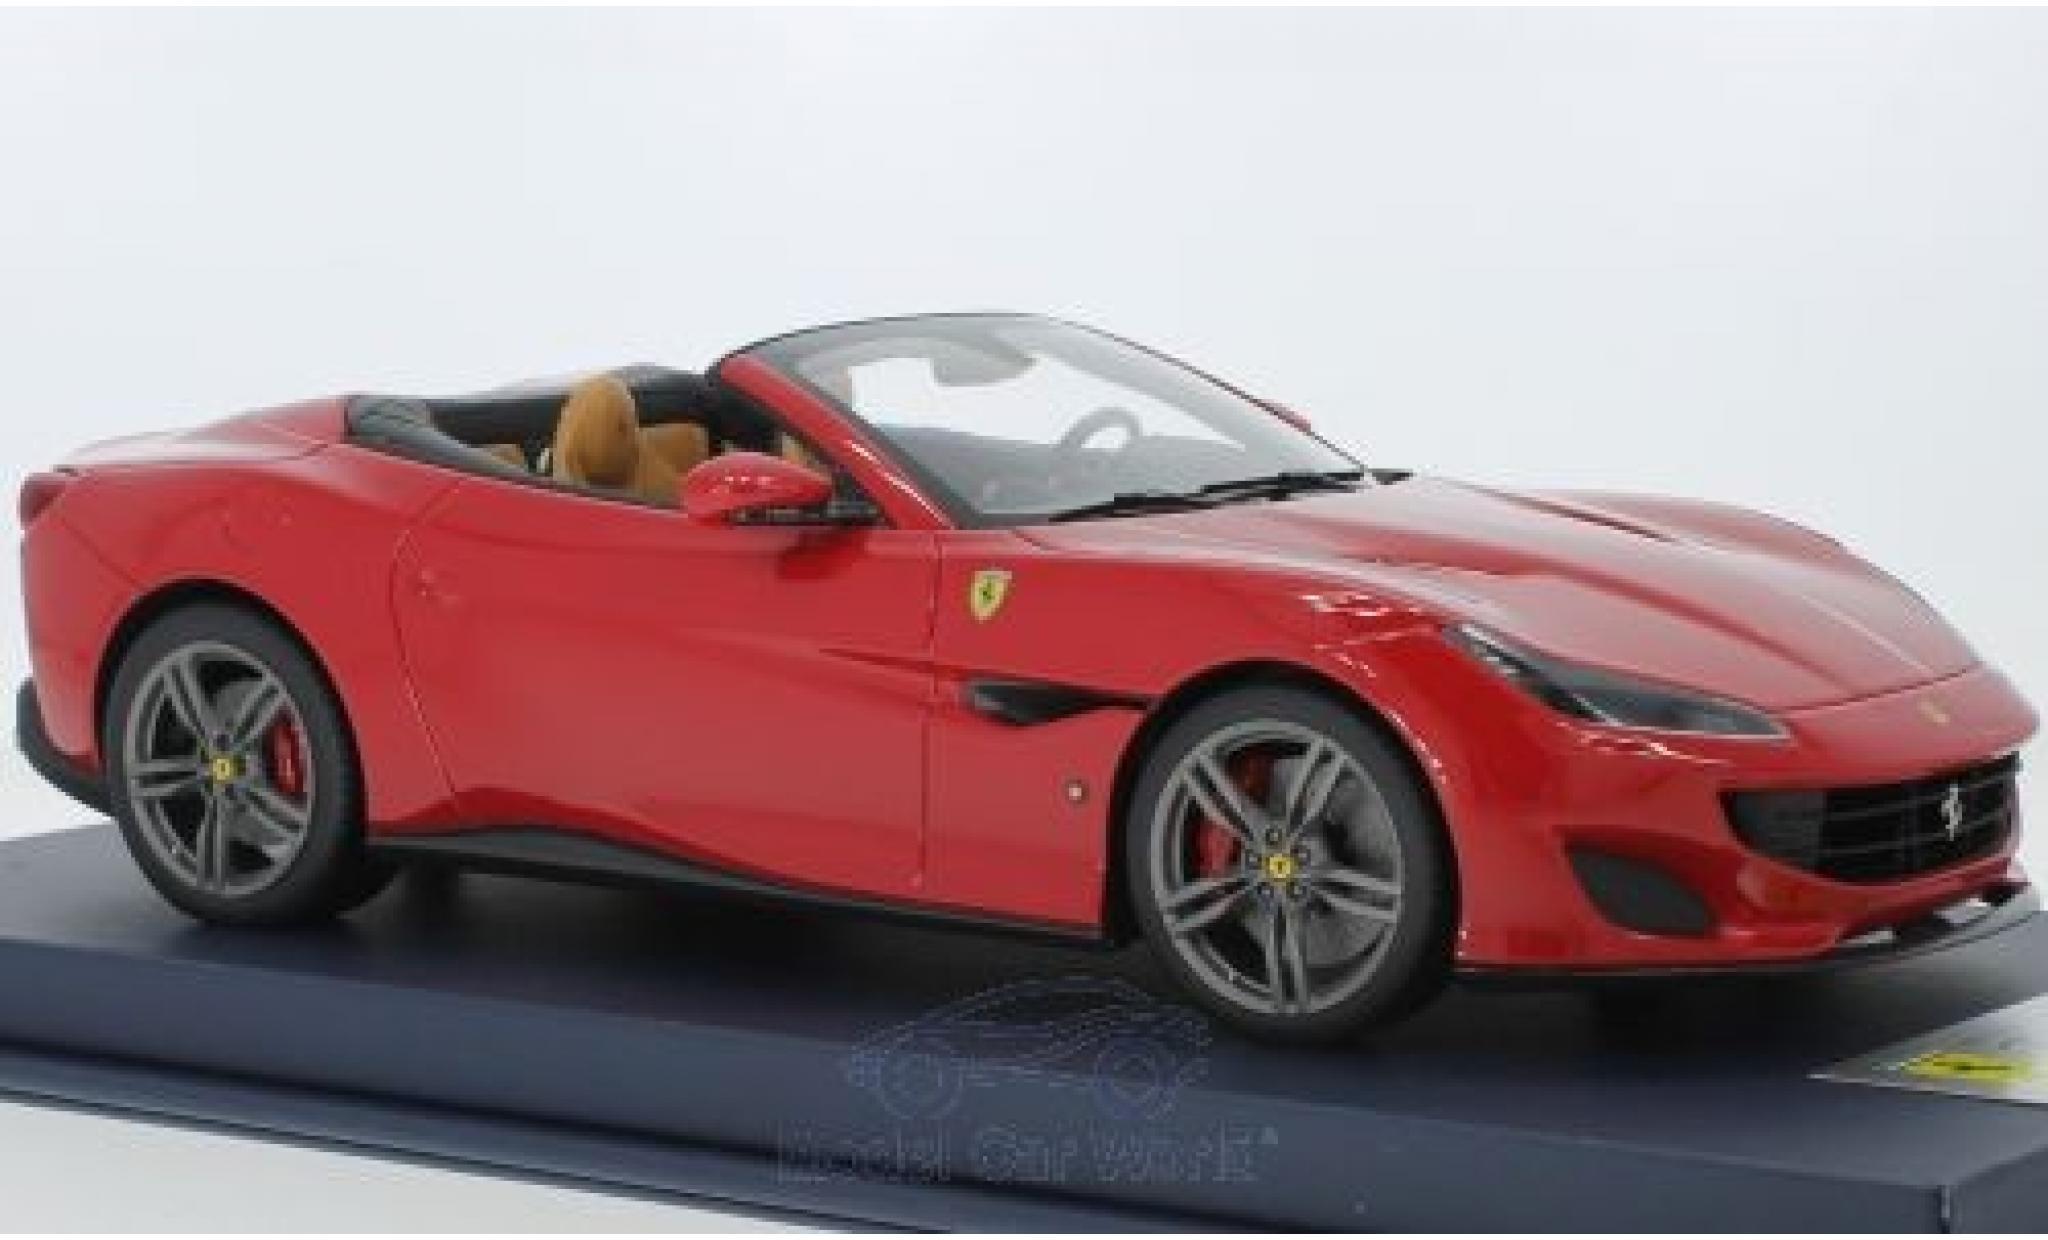 Ferrari Portofino 1/18 Look Smart red 2018 Interieur beige